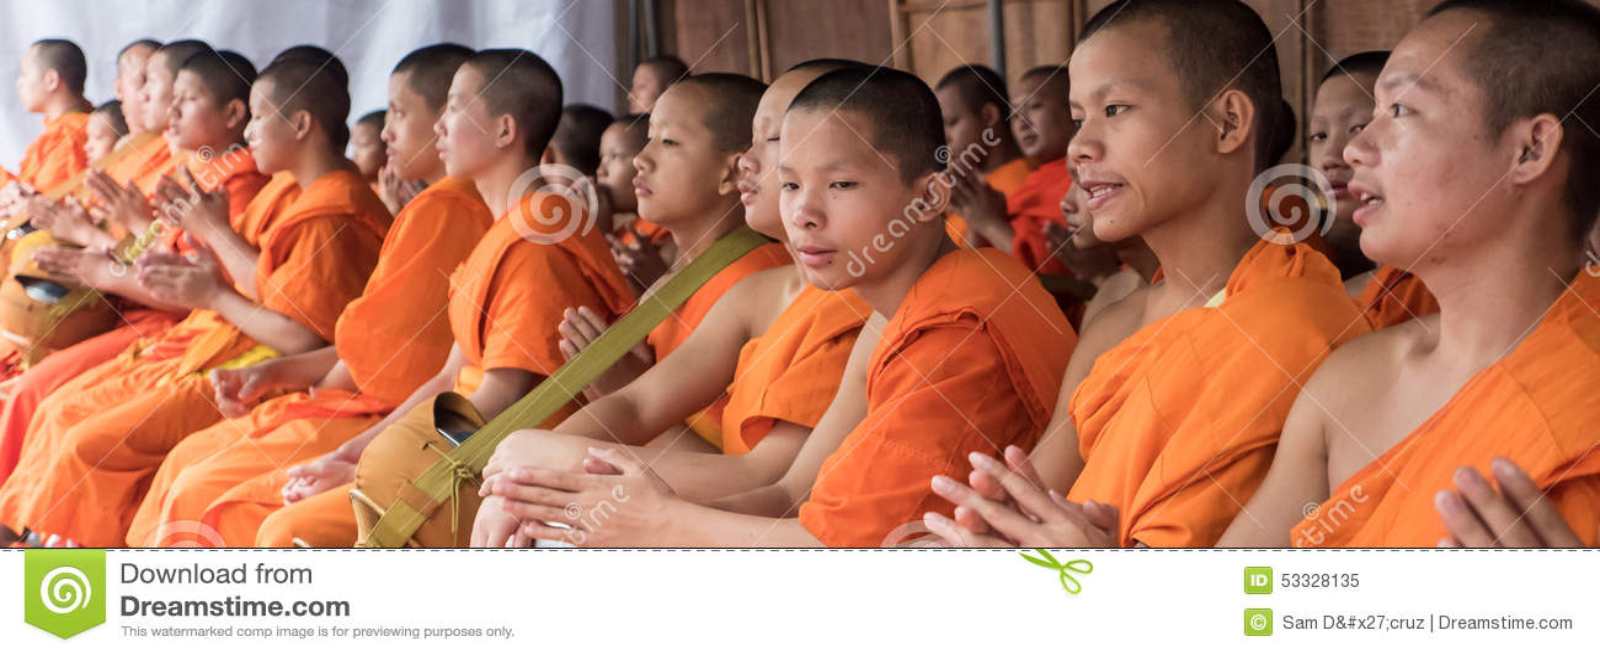 Michaelita datków ceremonia, Tajlandia